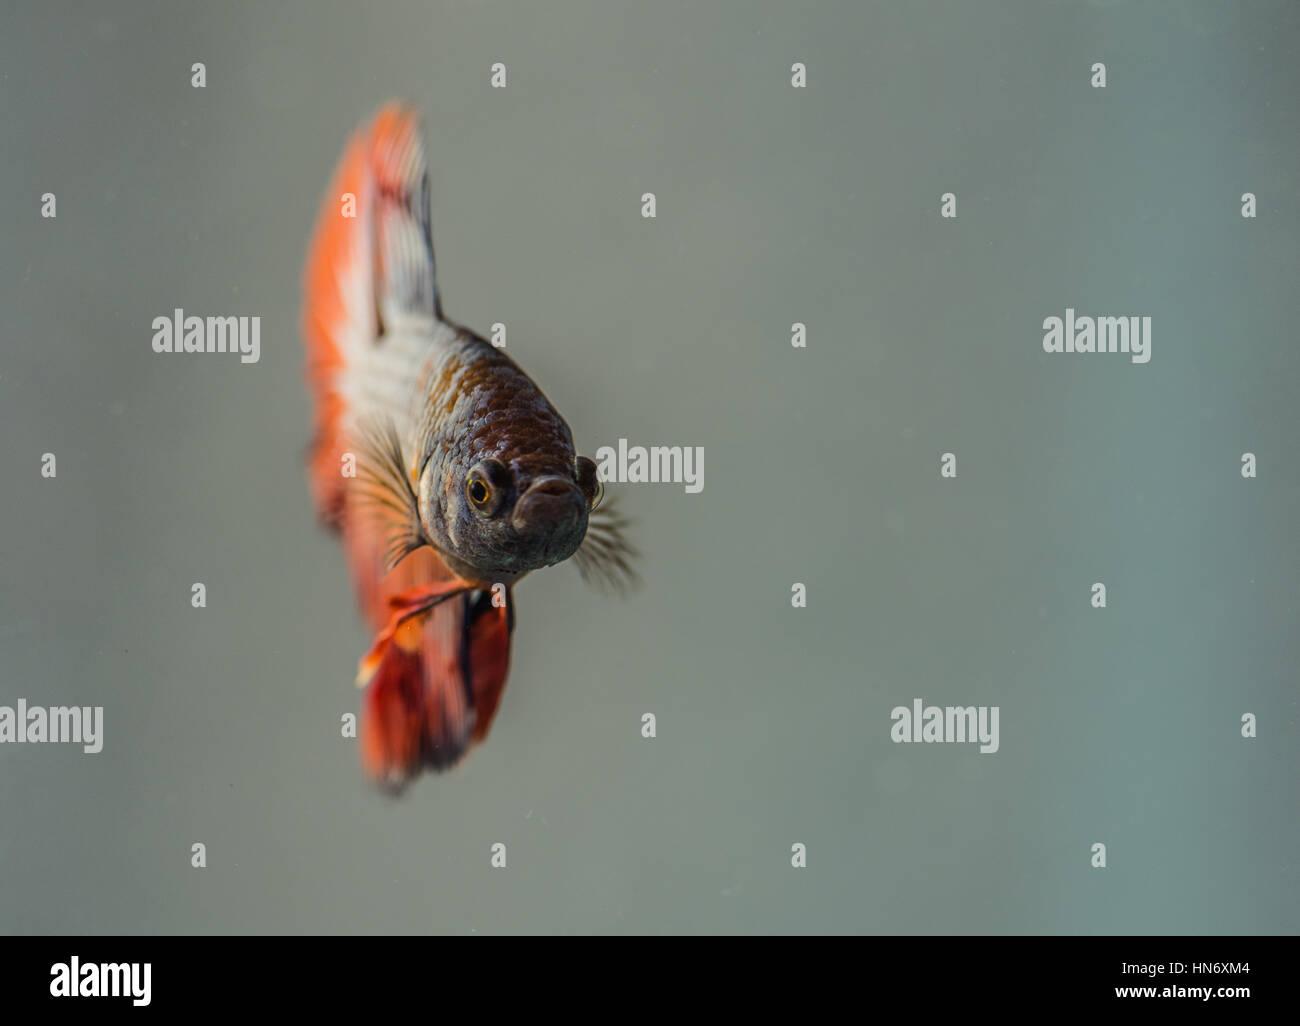 Betta Splendens (Siamese Fighting Fish), male. - Stock Image